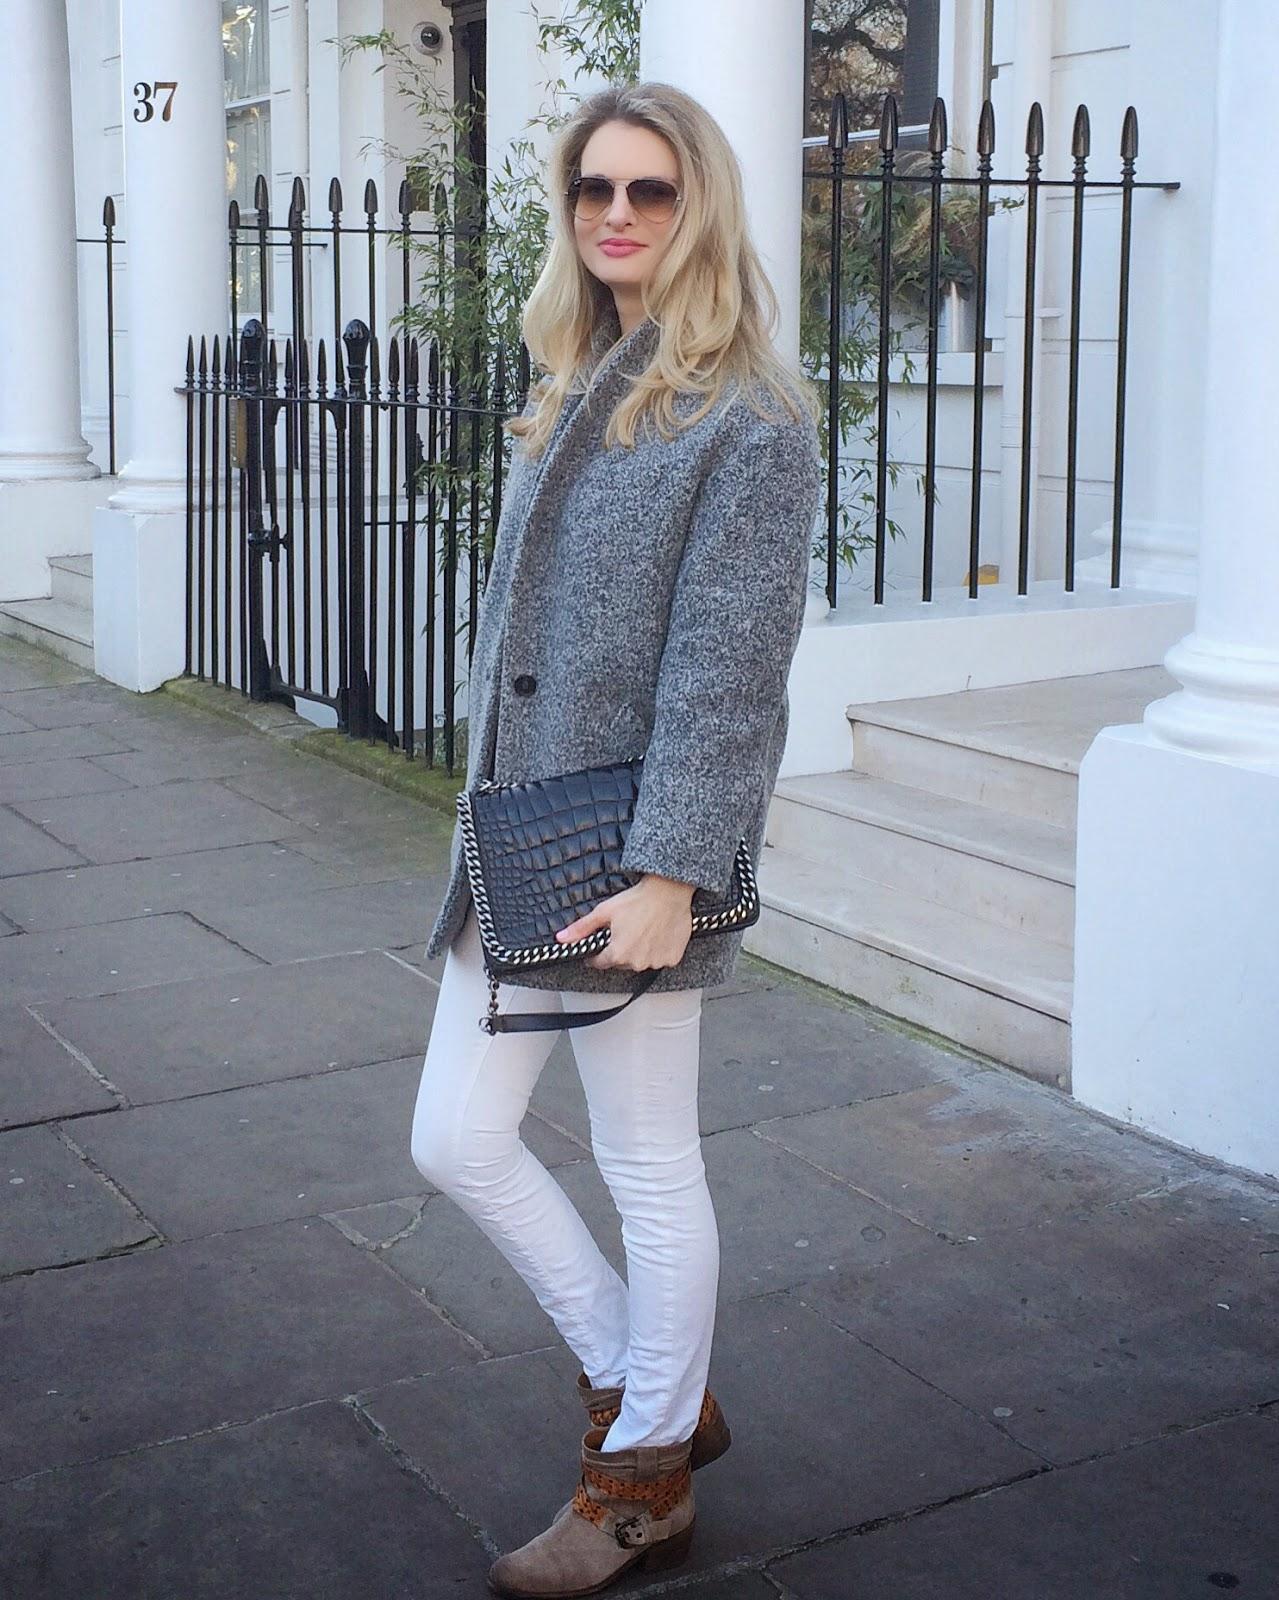 london street style, white skinny jeans, grey coat, iro coat, white jeans and grey coat, beige boots, russell and bromley boots, blonde hair, blonde wavy hair, ray ban sunglasses, zara croco bag, zara city bag croco